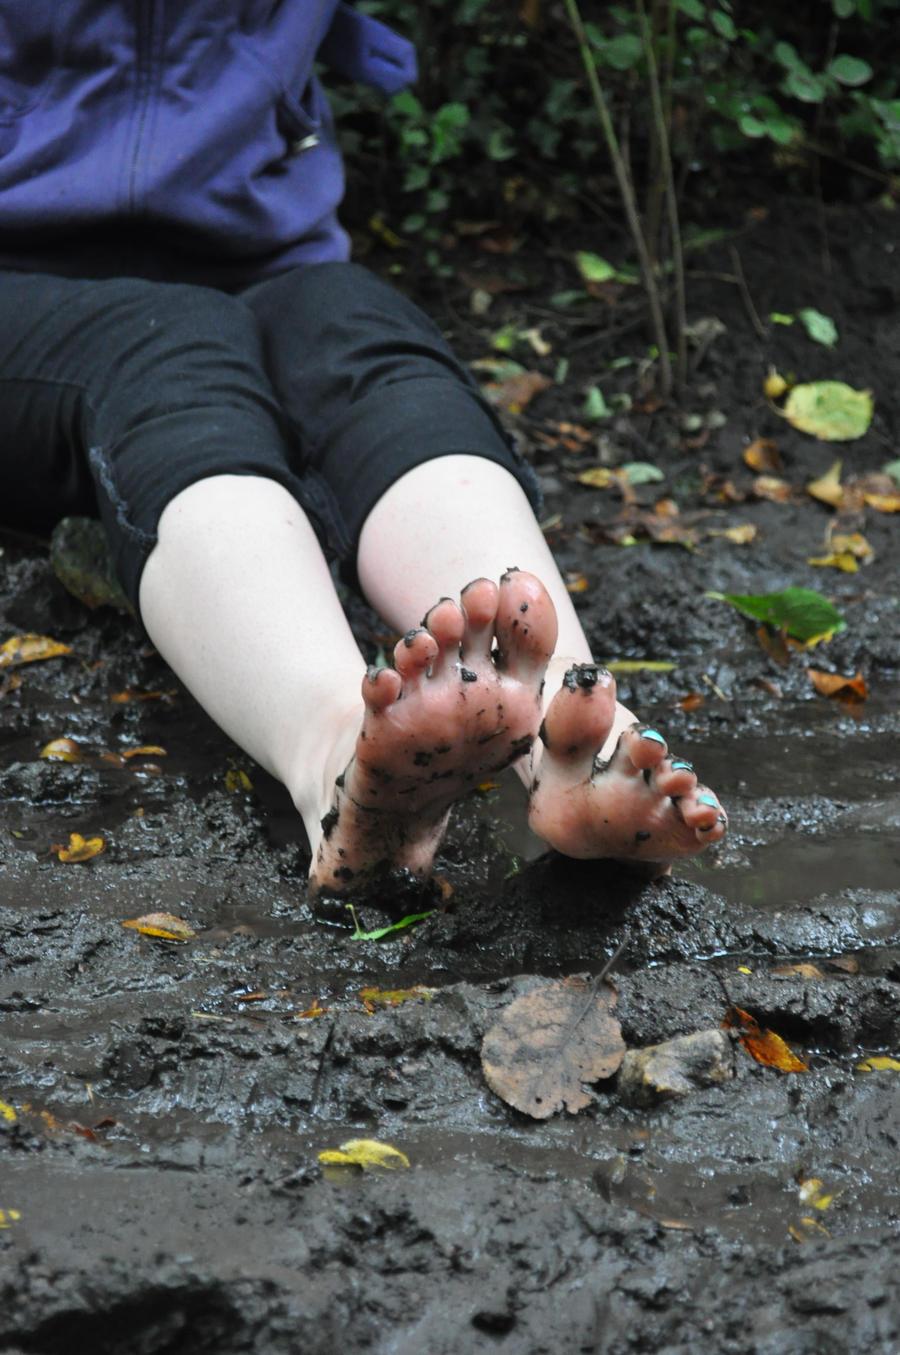 Muddy Little Feet by Foxy-Feet on DeviantArt